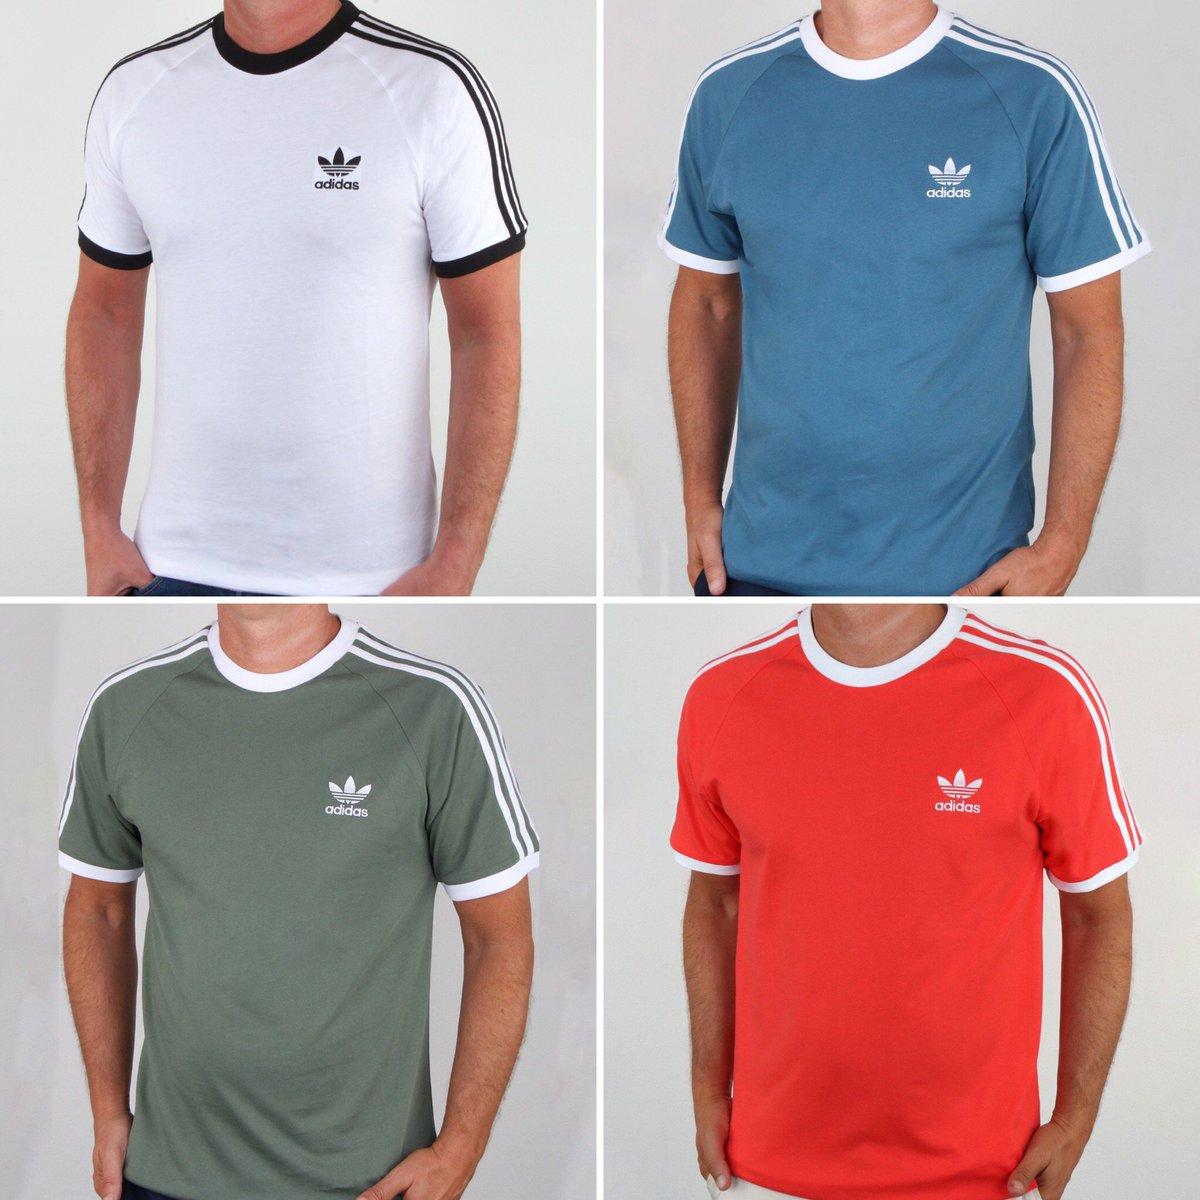 adidas originals 80s t shirt